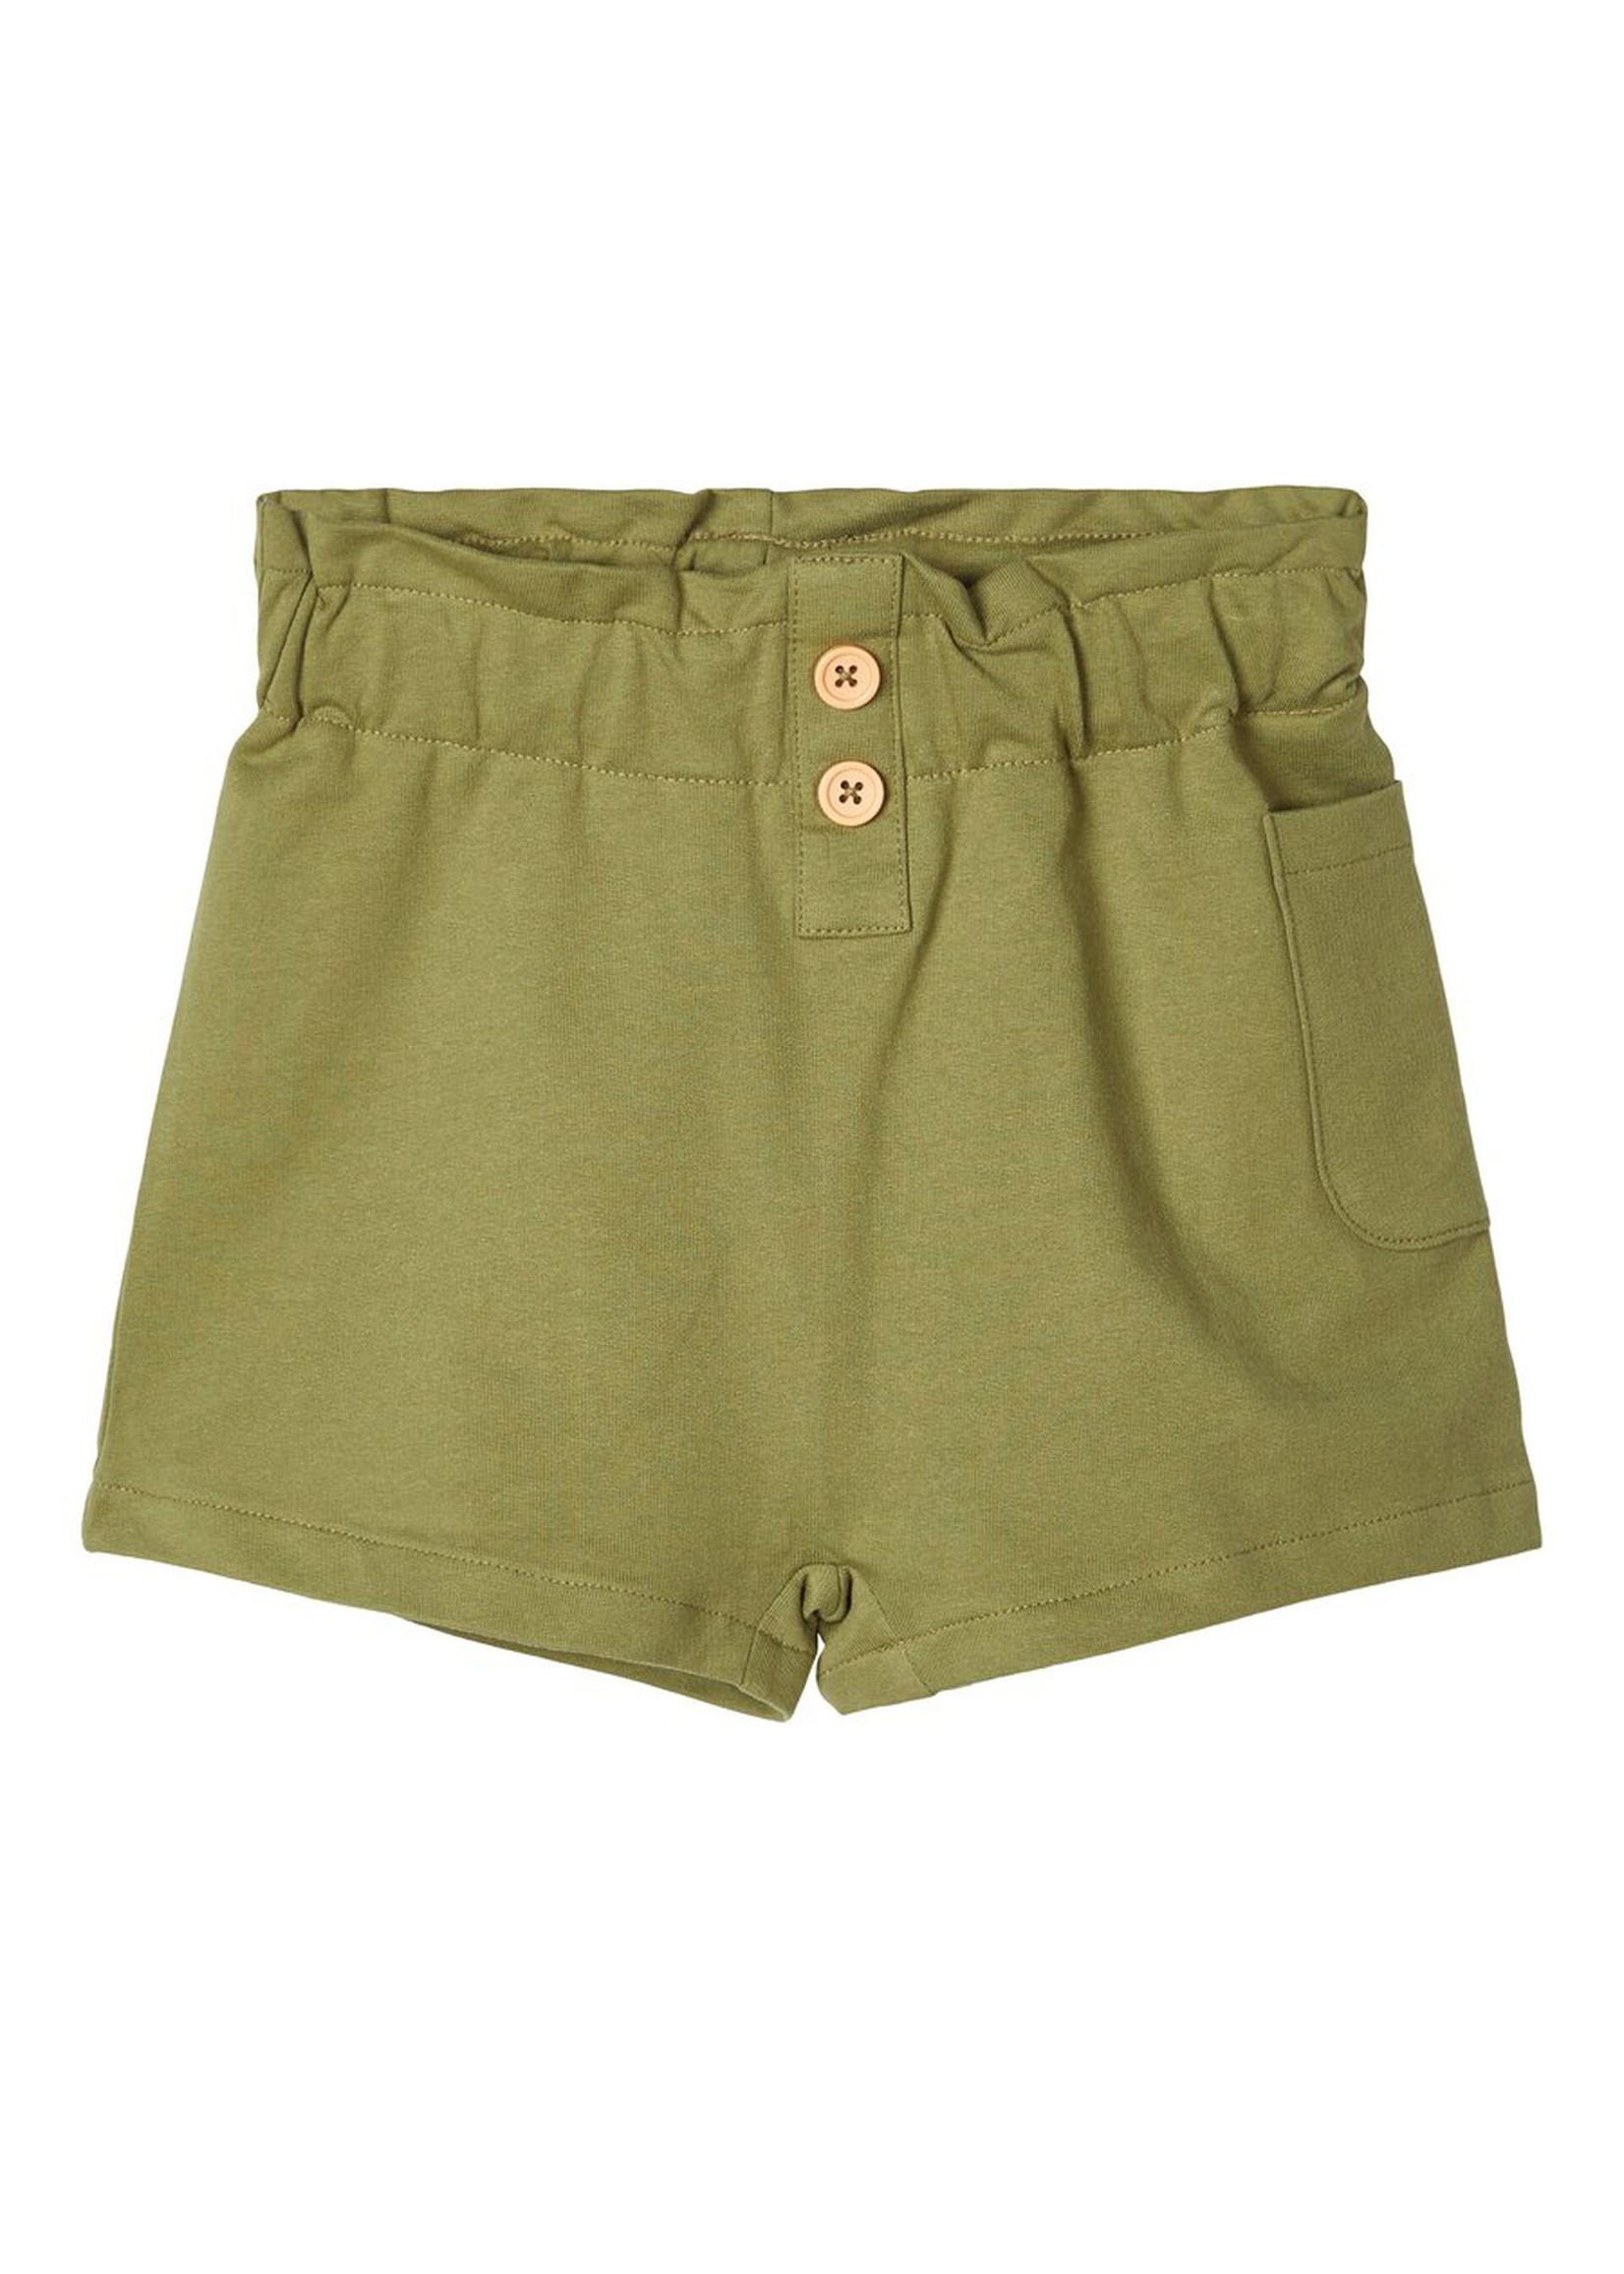 Name it shorts maat 80 + 104